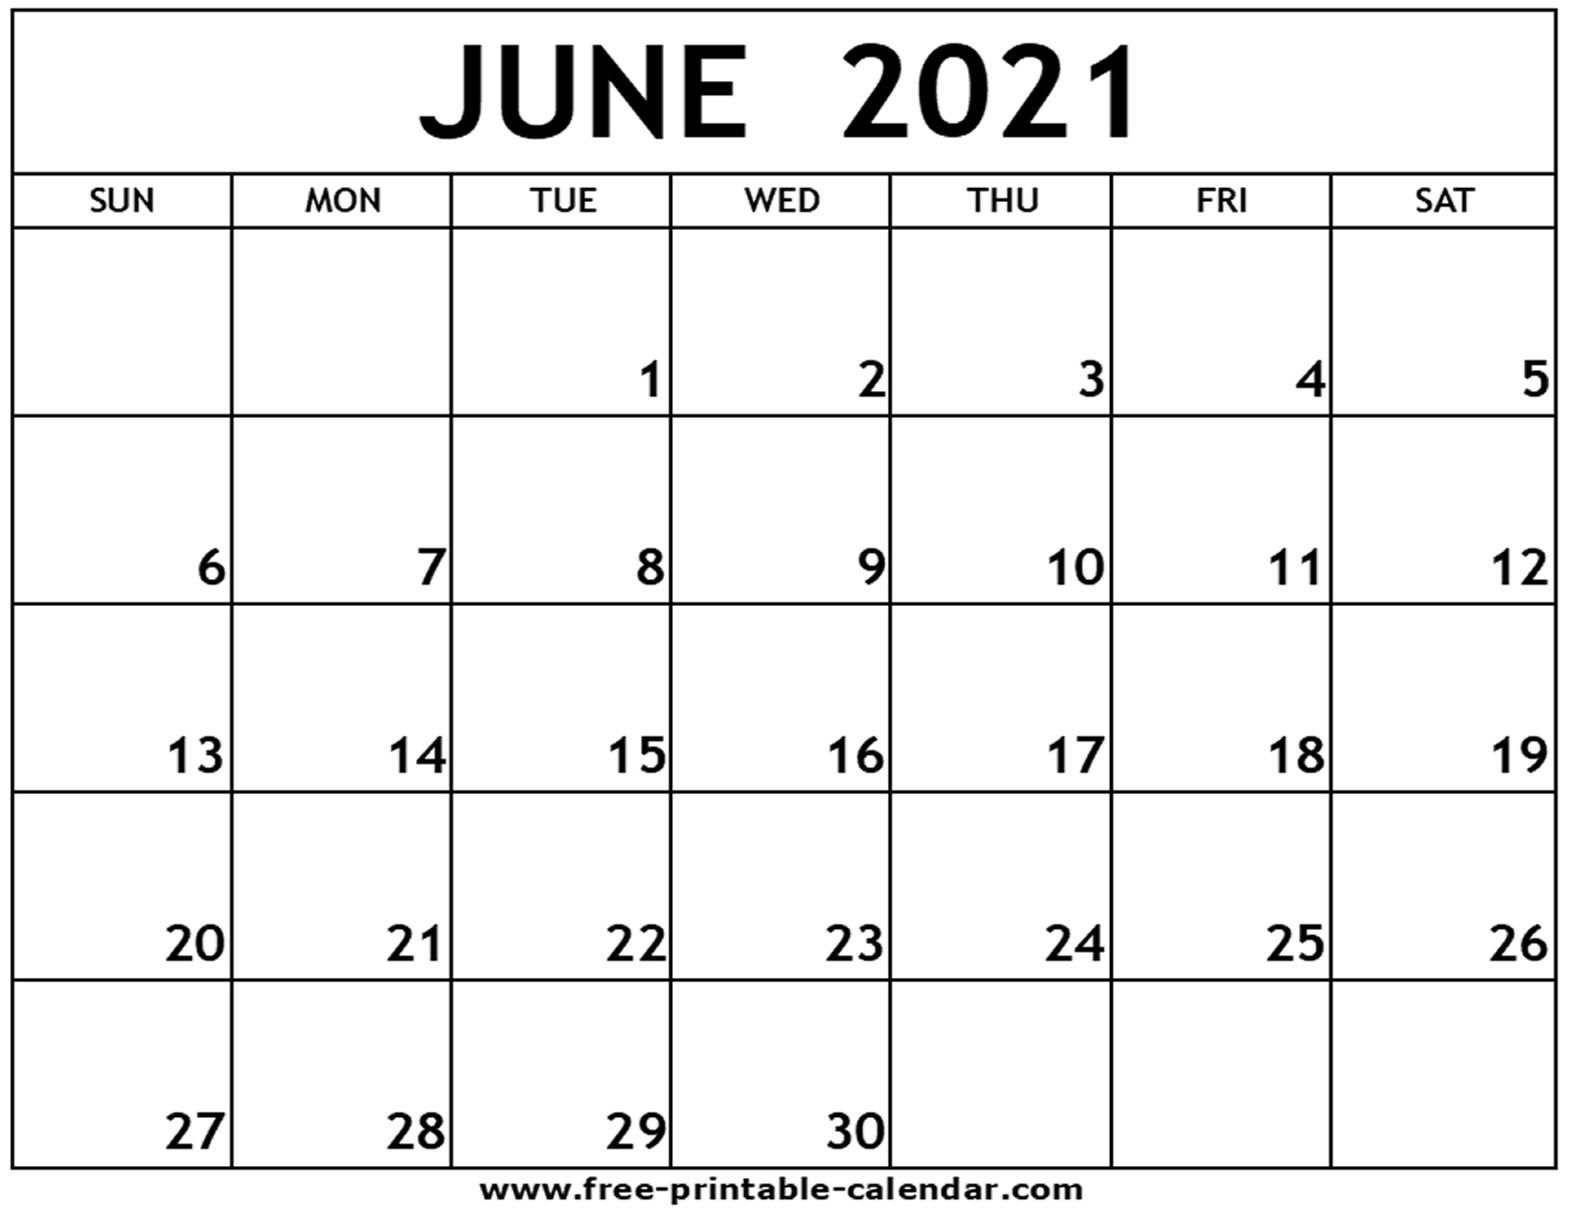 Universal Free Calendars 2021 Printable That You Can Edit   Get Your Calendar Printable June 2021 Calendar Panchang